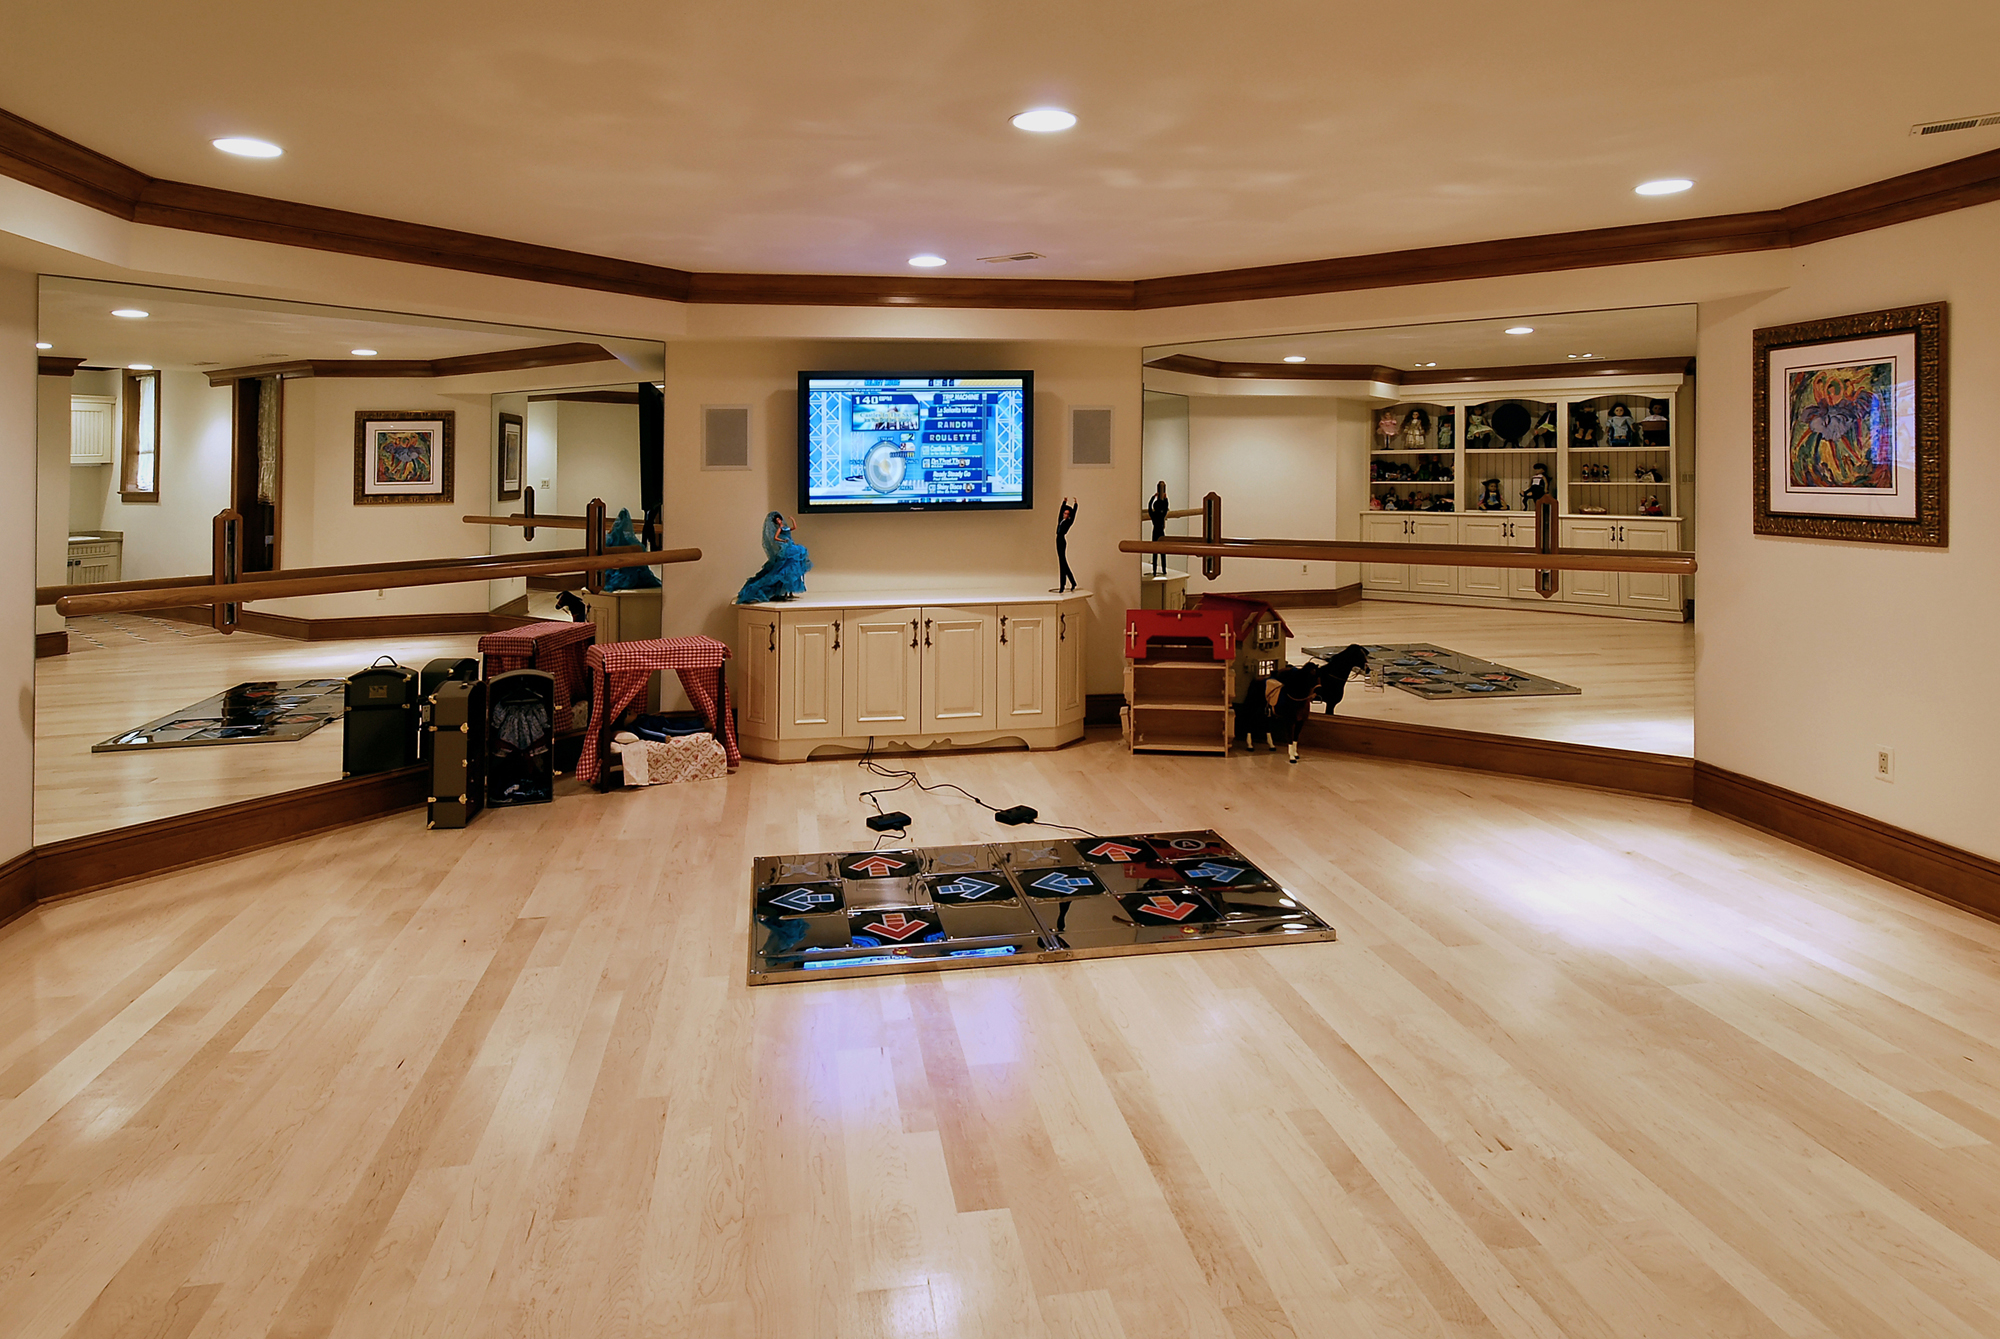 Dance Studio Design Ideas Home Art Dma Homes: Multi-space Renovation In Potomac, Maryland